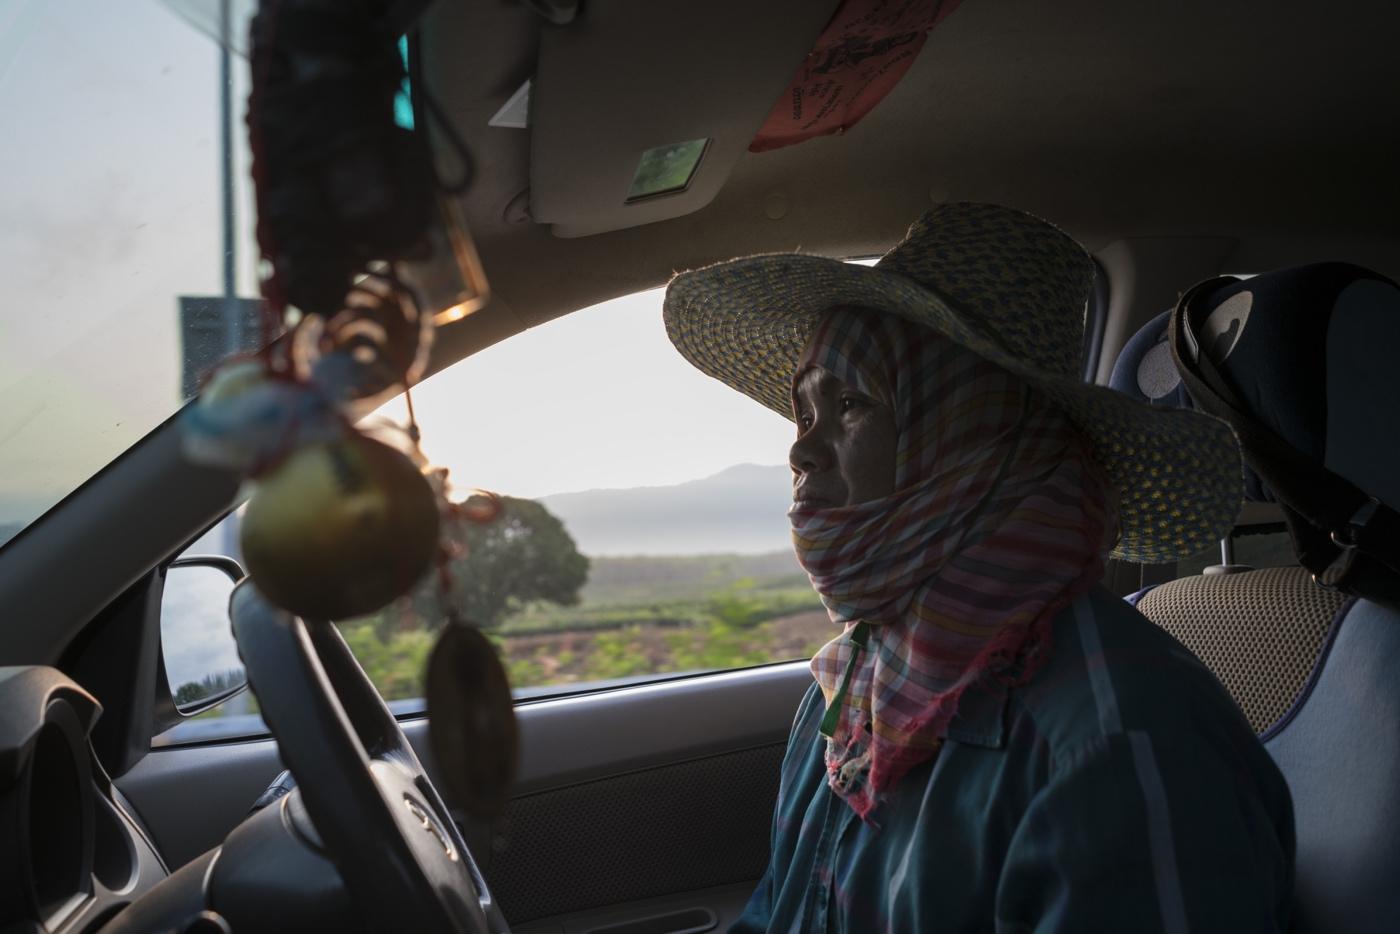 WWF Thailand, Kui Buri - Prachuab Puata